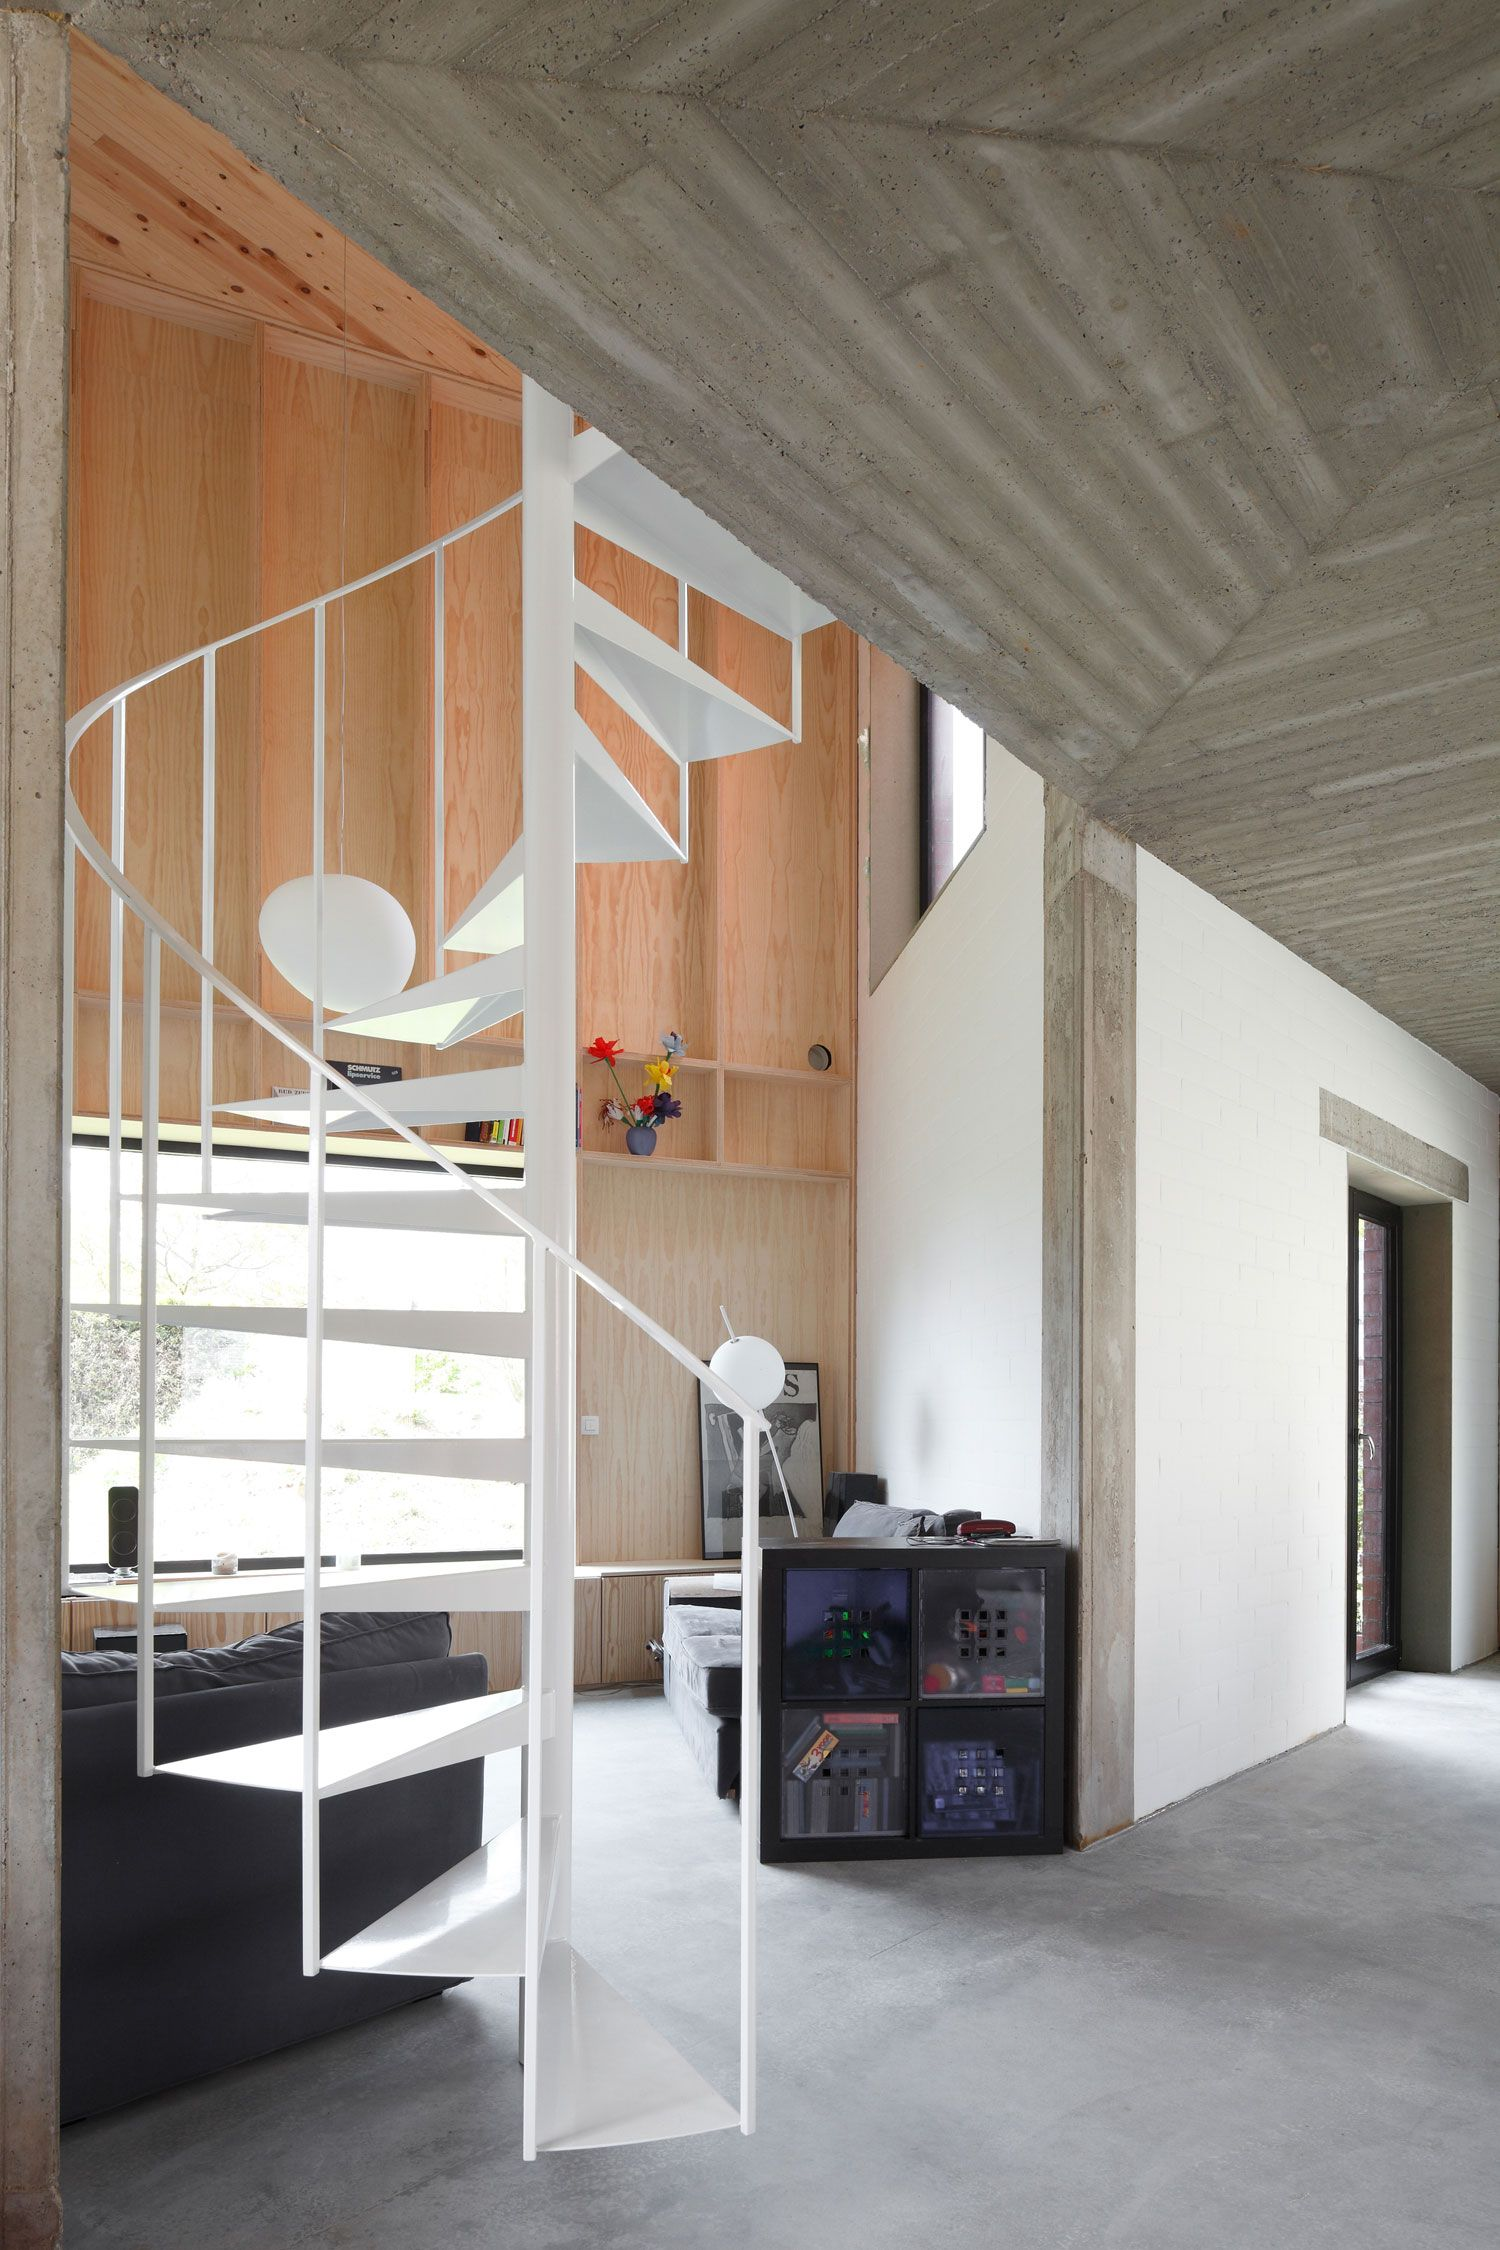 Home in Wondelgem by BLAF Architecten